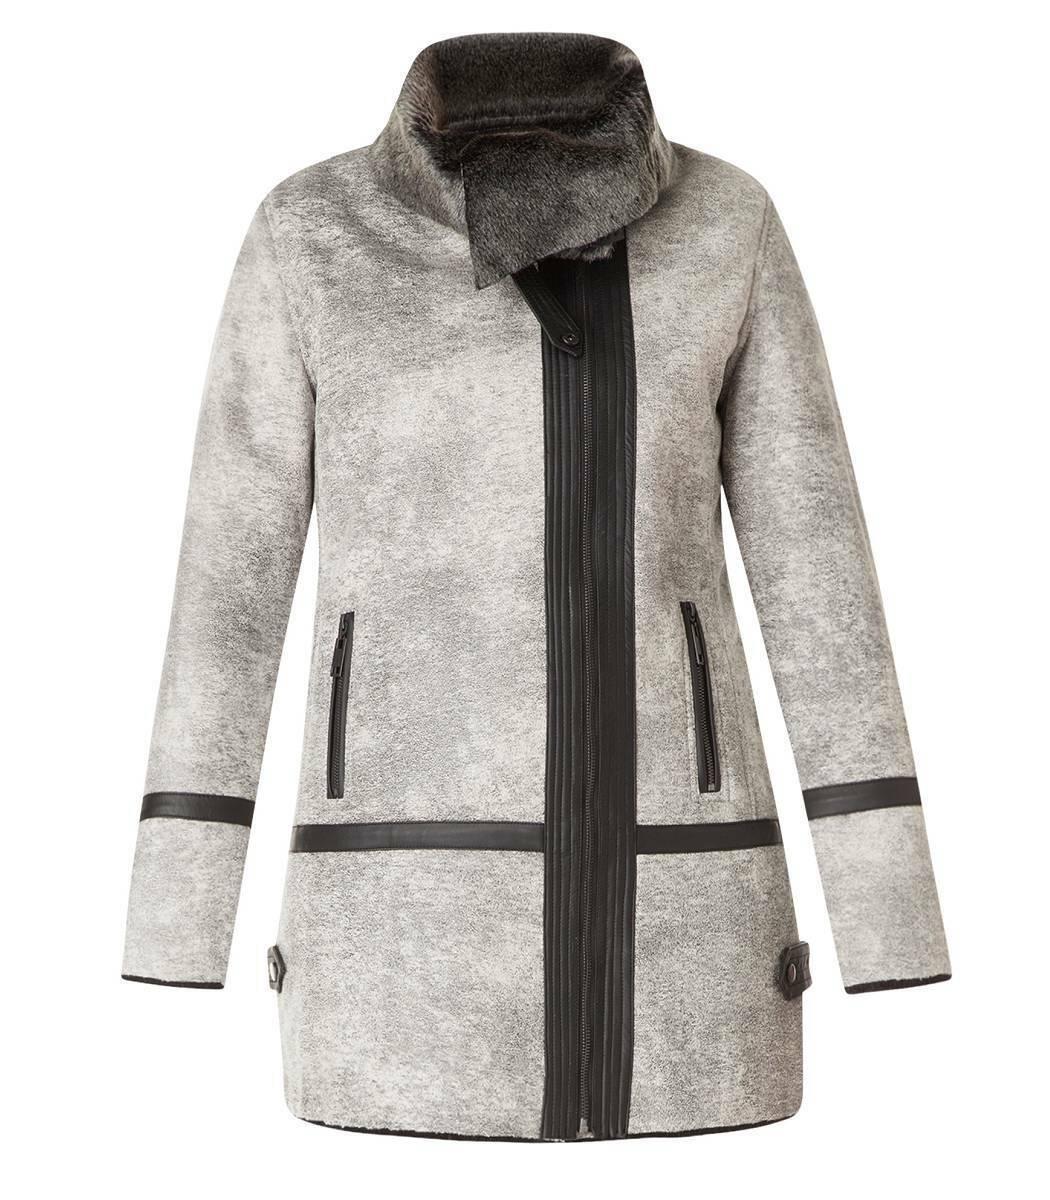 Vintage Kunstleder-Jacke Damen gefüttert XXL große Größen Herbst Winter